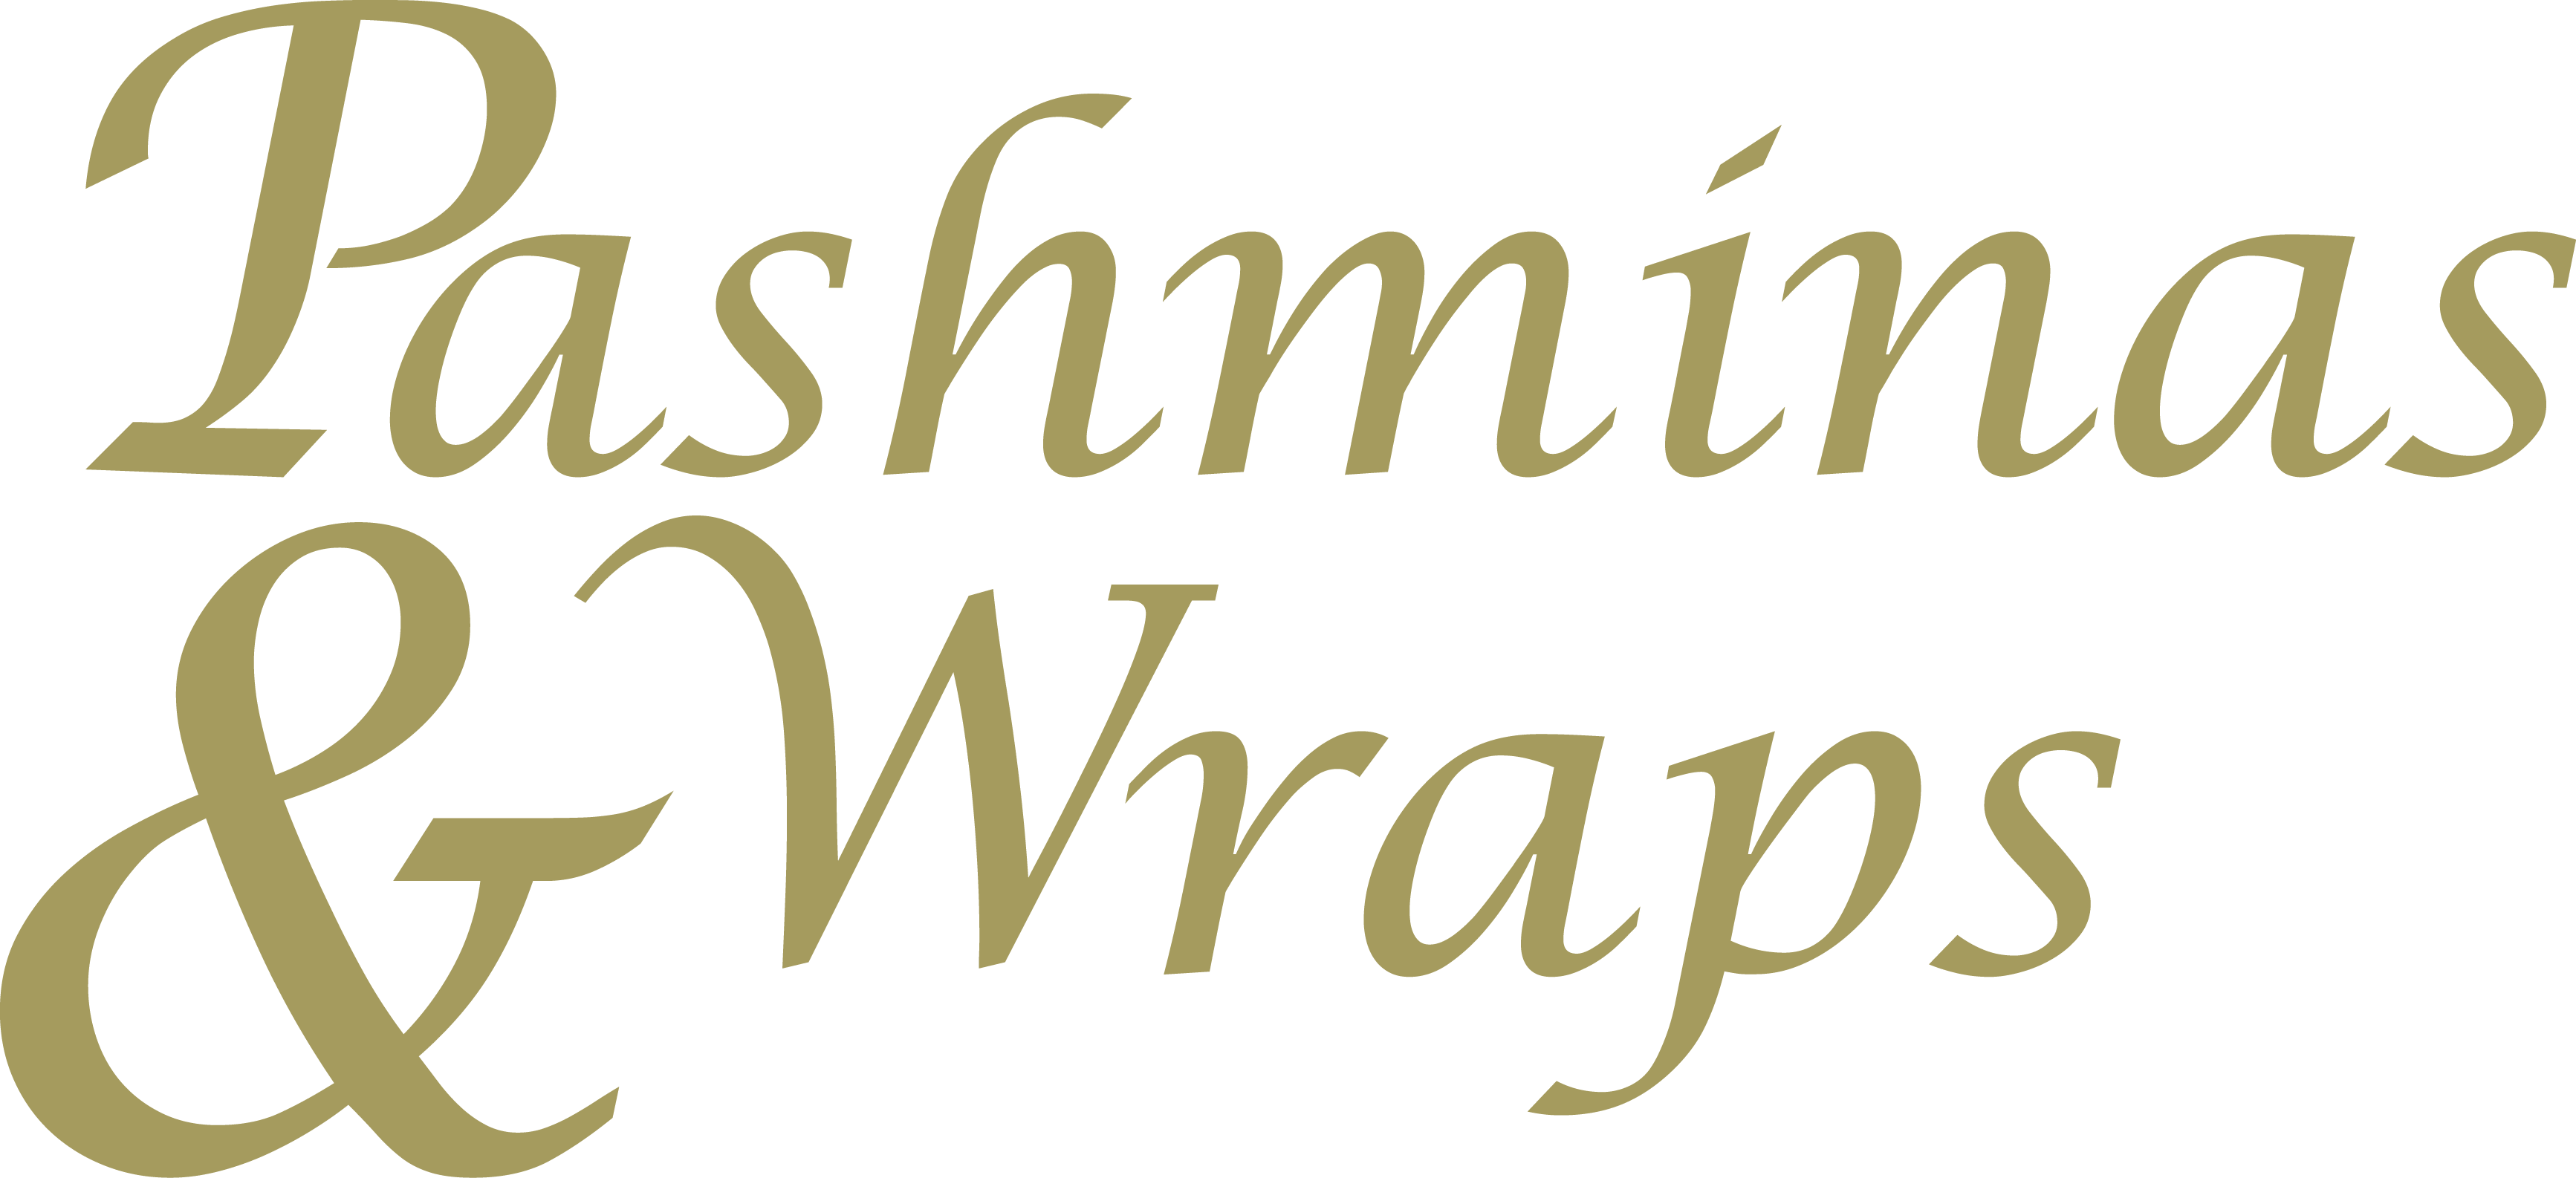 Read Pashminas & Wraps Reviews